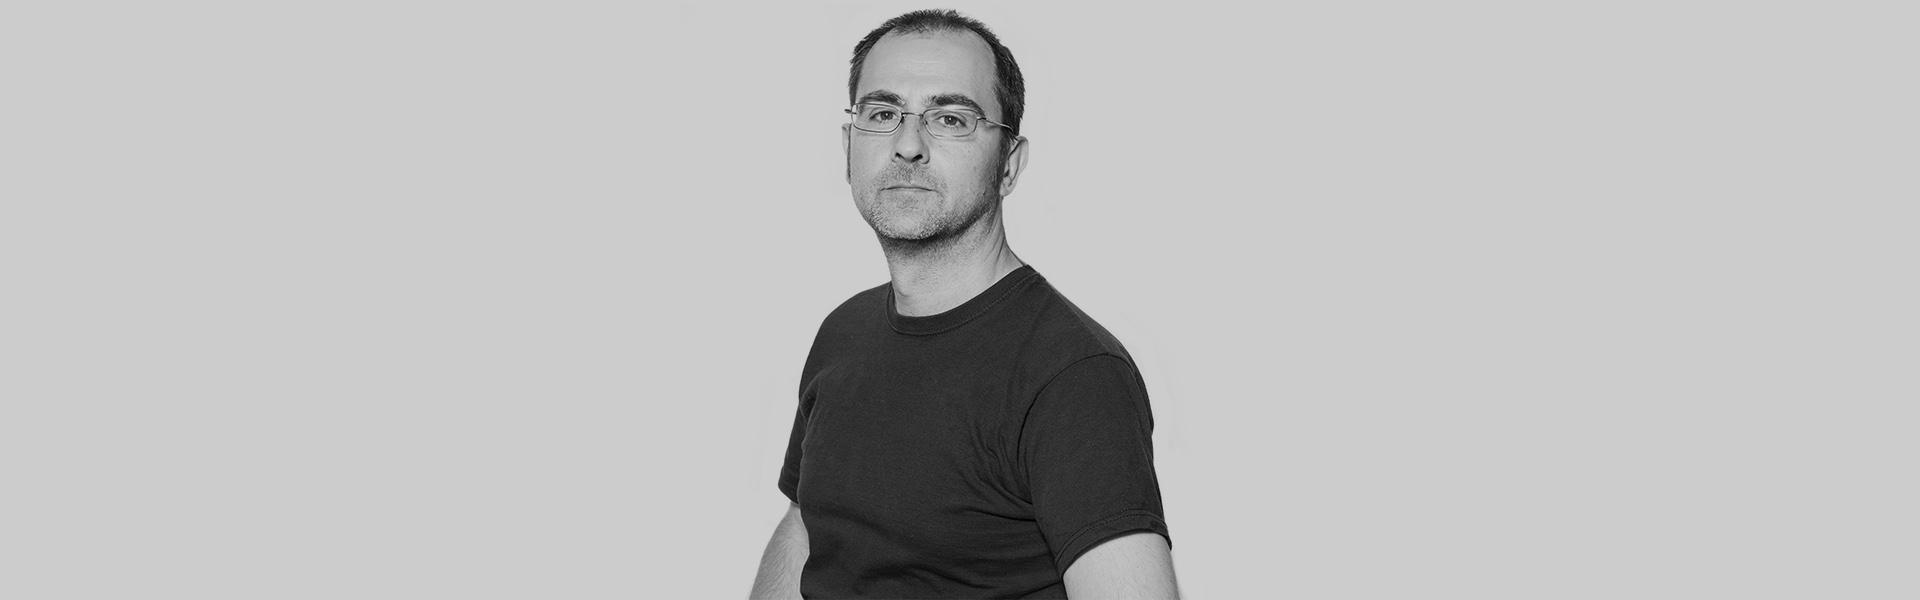 Enric Montes